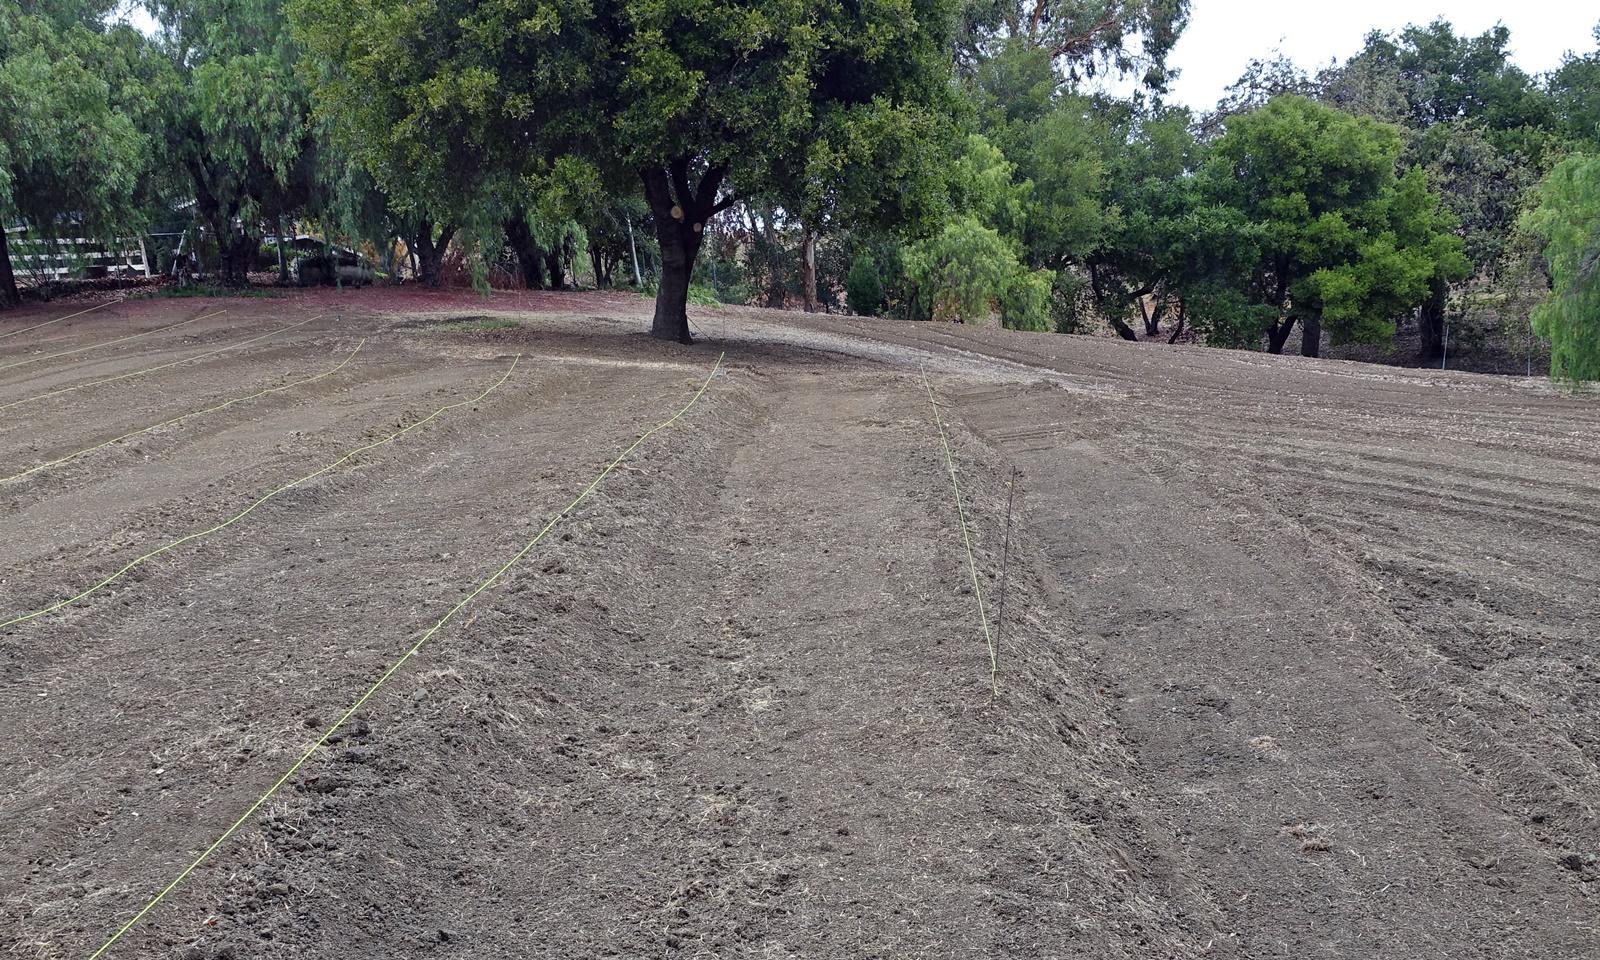 2. Terracing the vineyard